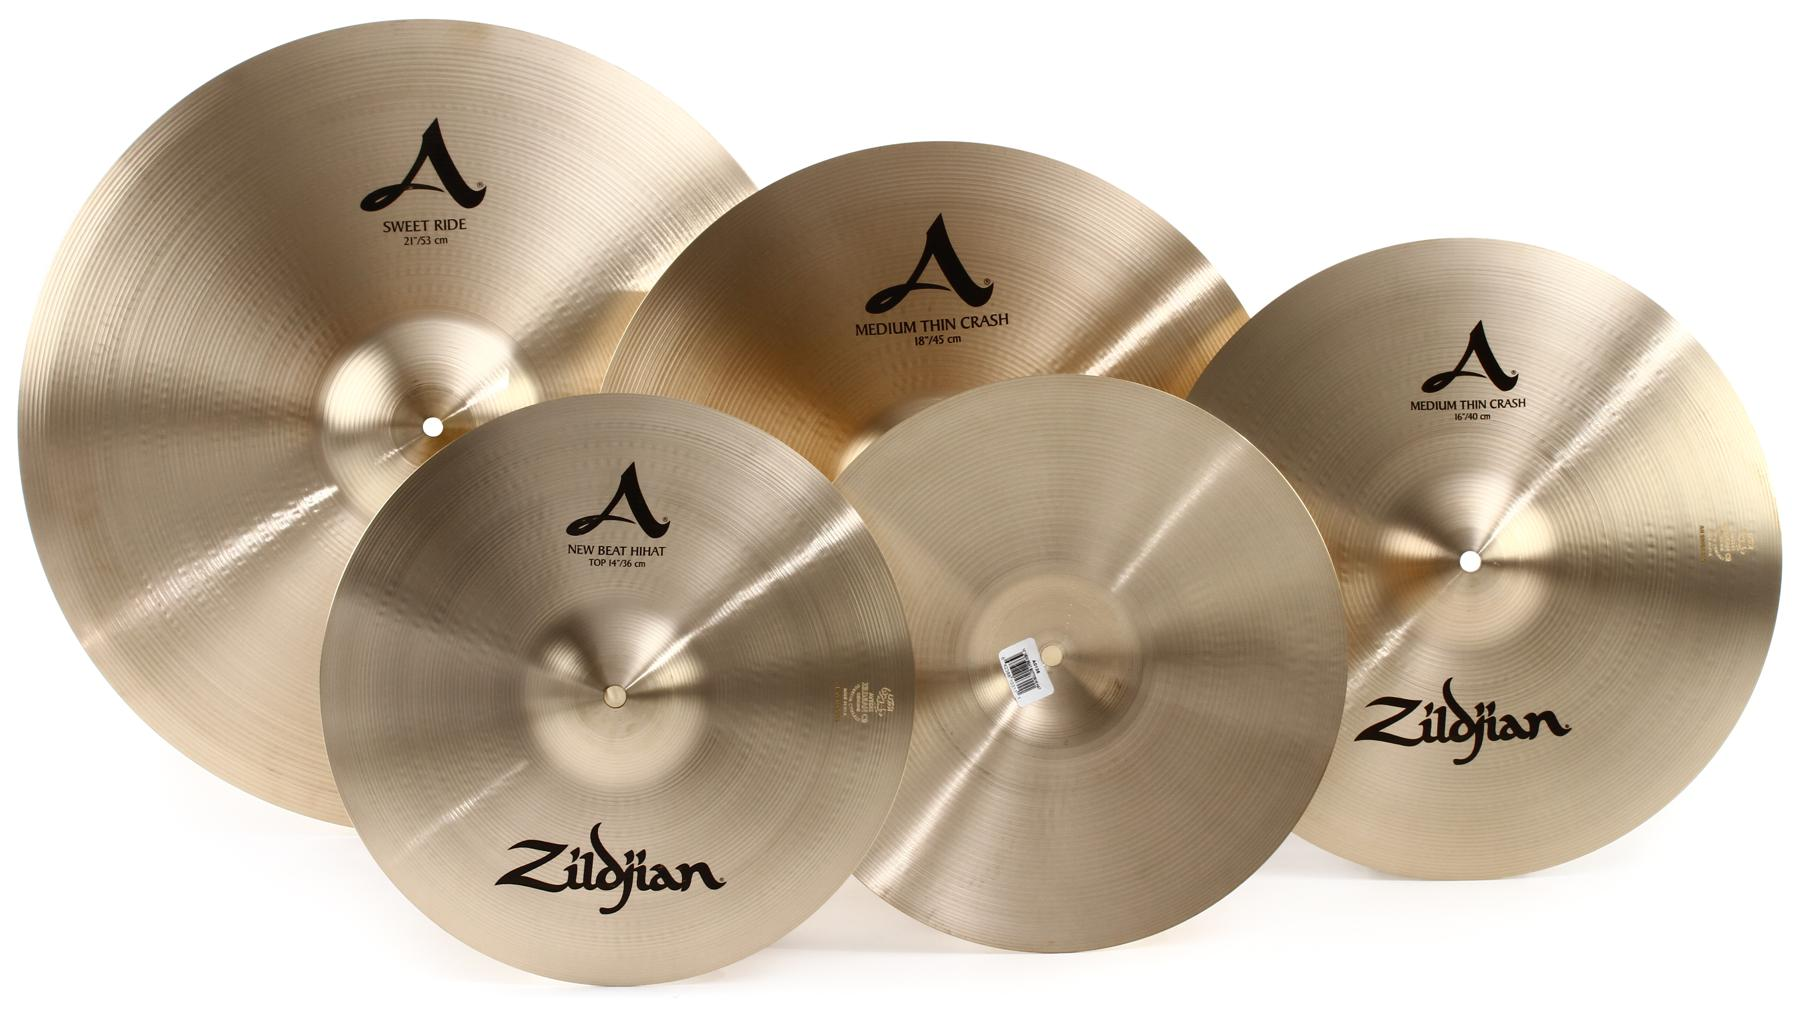 1. Zildjian Cymbal Sets